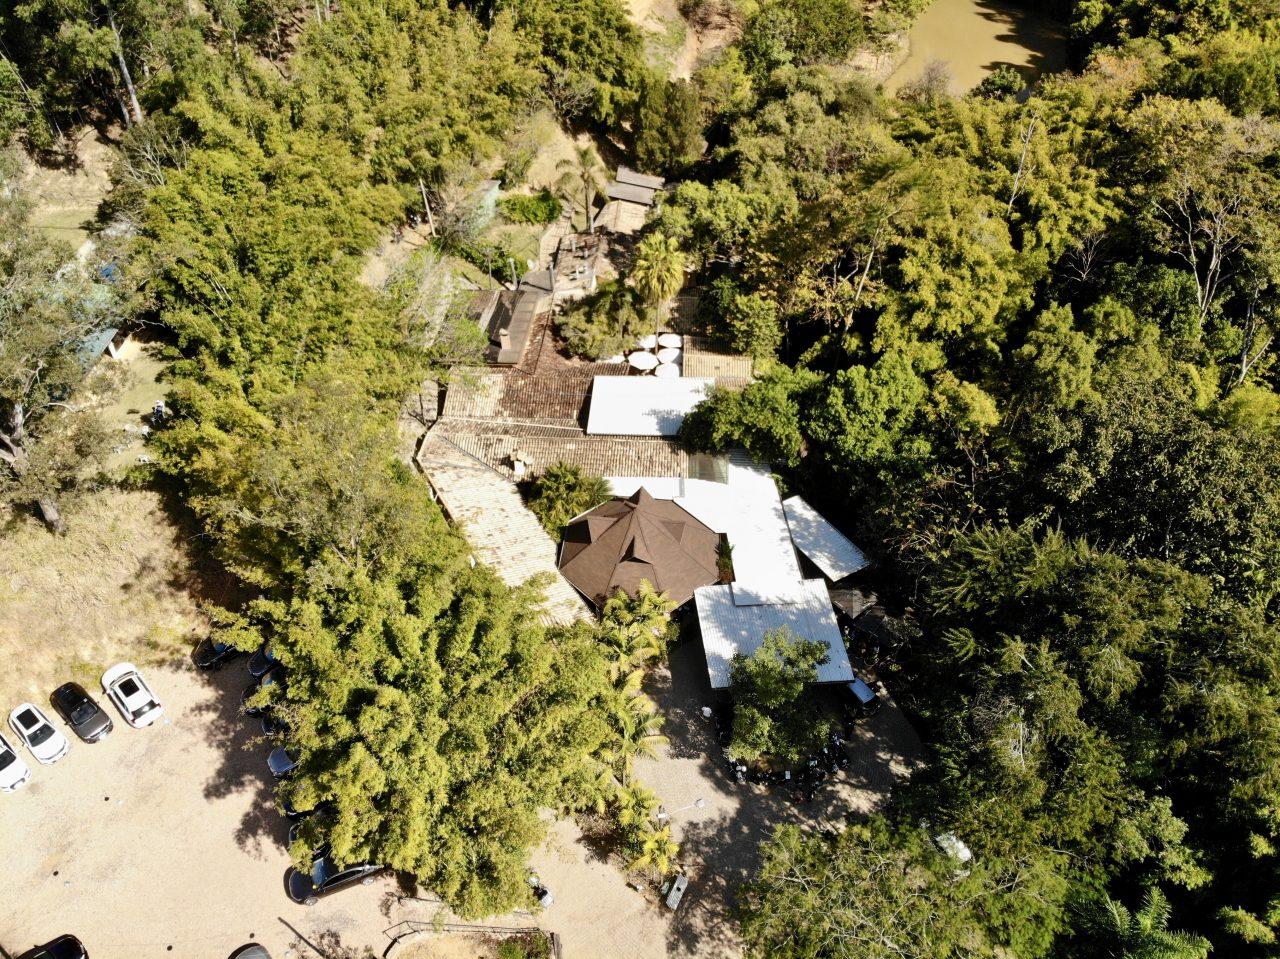 Vila Paraiso Sporttechtips drone view